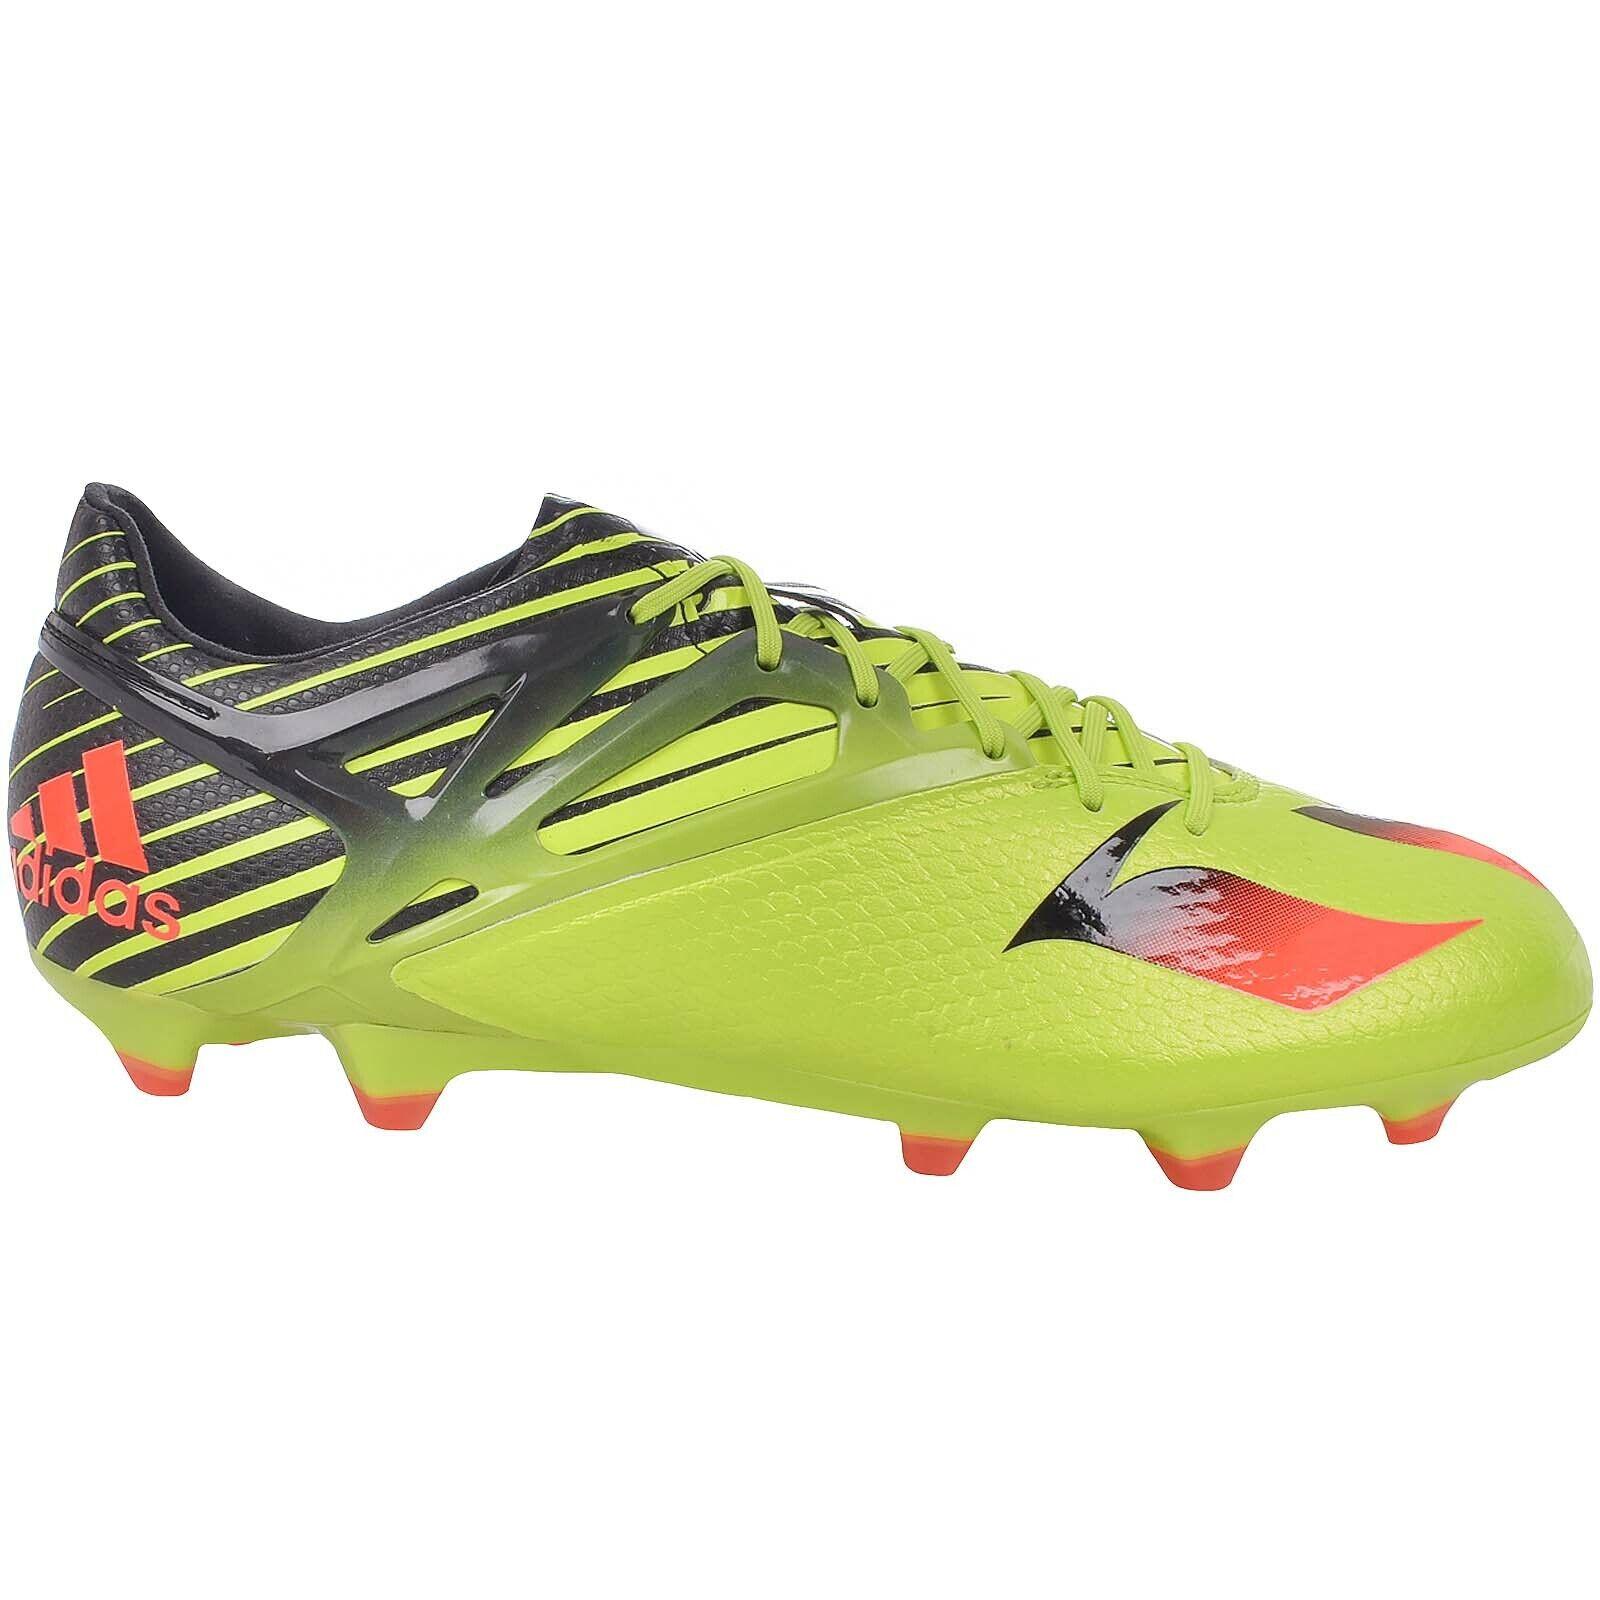 Adidas Performance Herren Messi 15.1 Festen Boden Fußballschuhe Schuhe - Grün